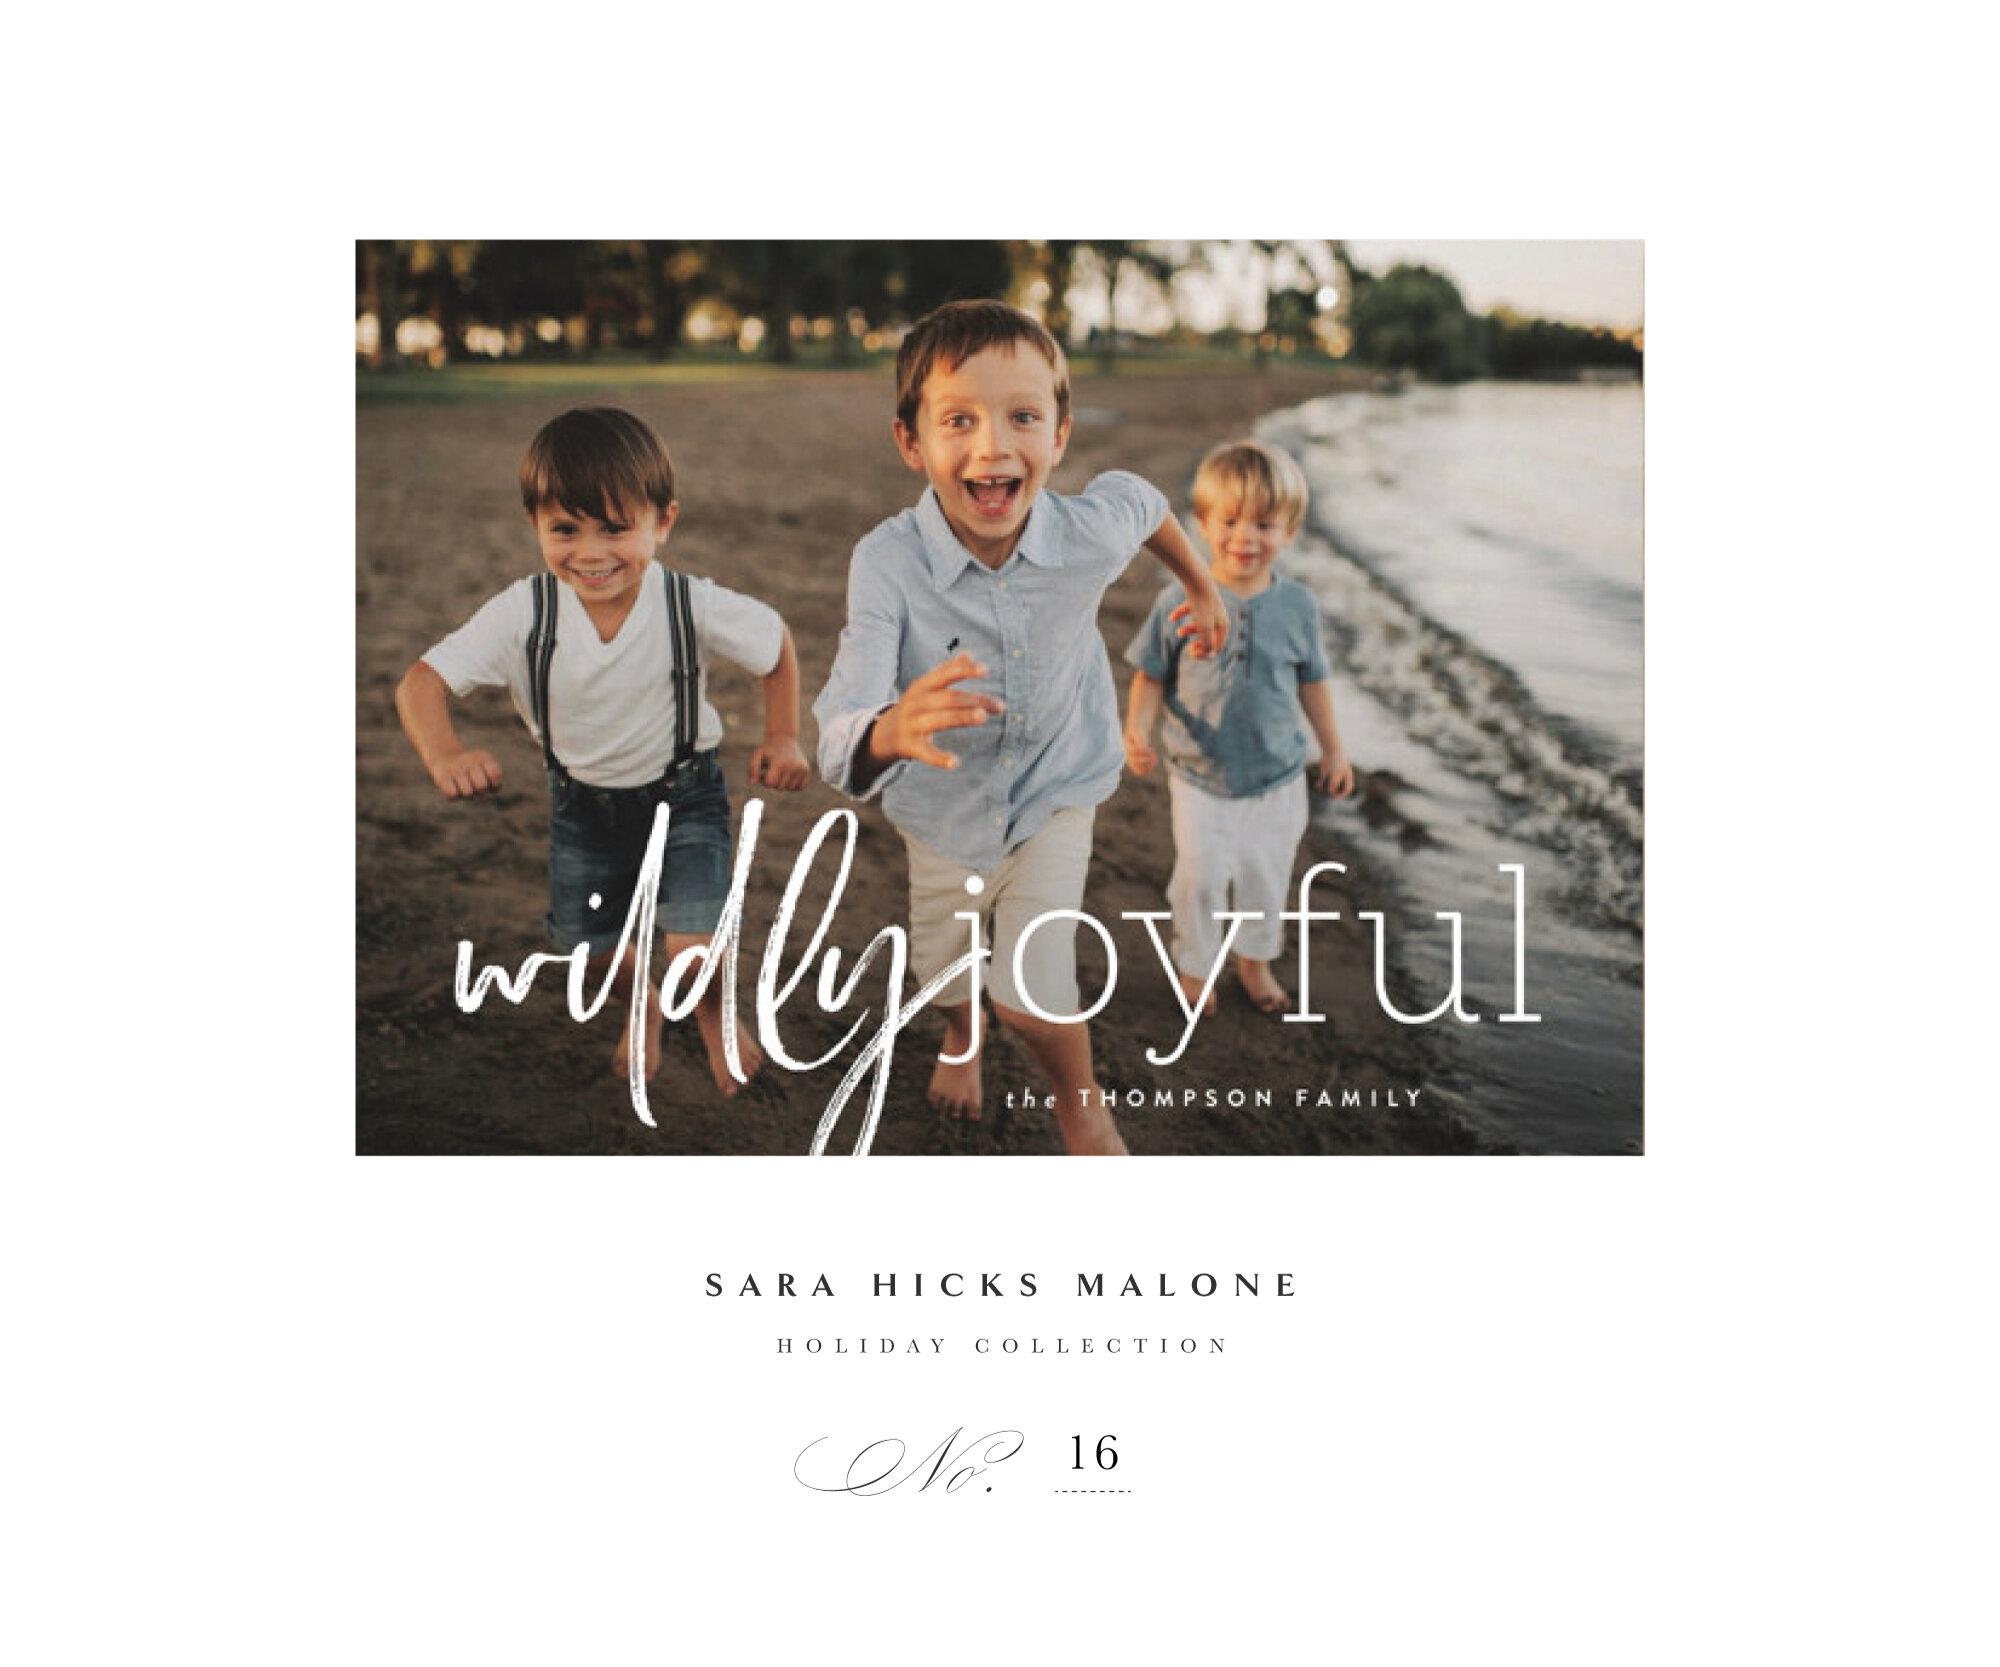 'WILD AND JOYFUL' by Sara Hicks Malone